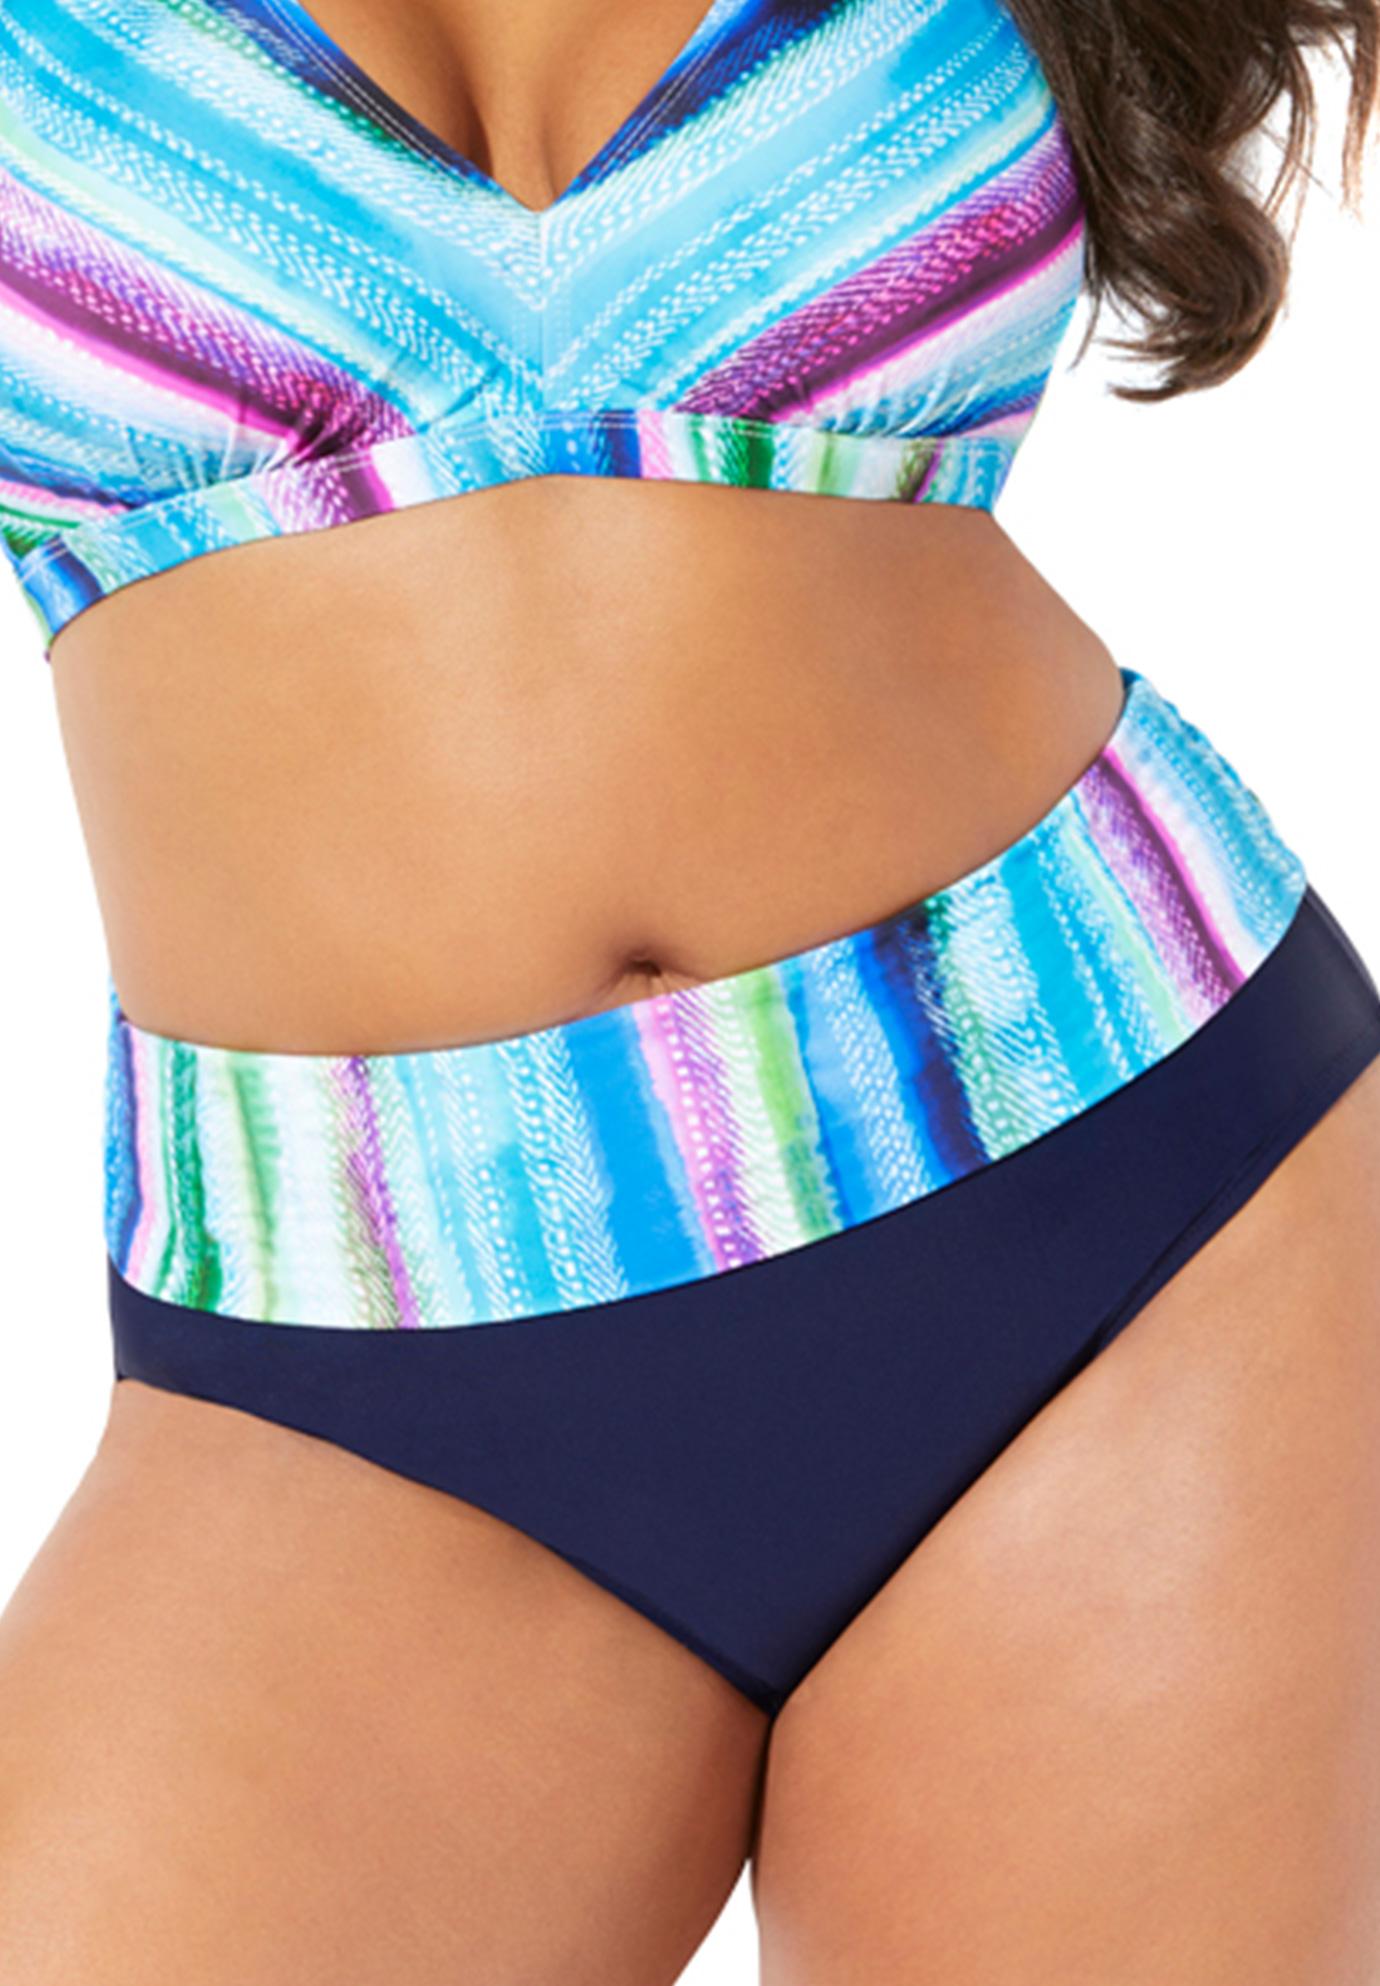 Plus Size Women's Foldover Swim Brief by Swimsuits For All in Multi Stripe